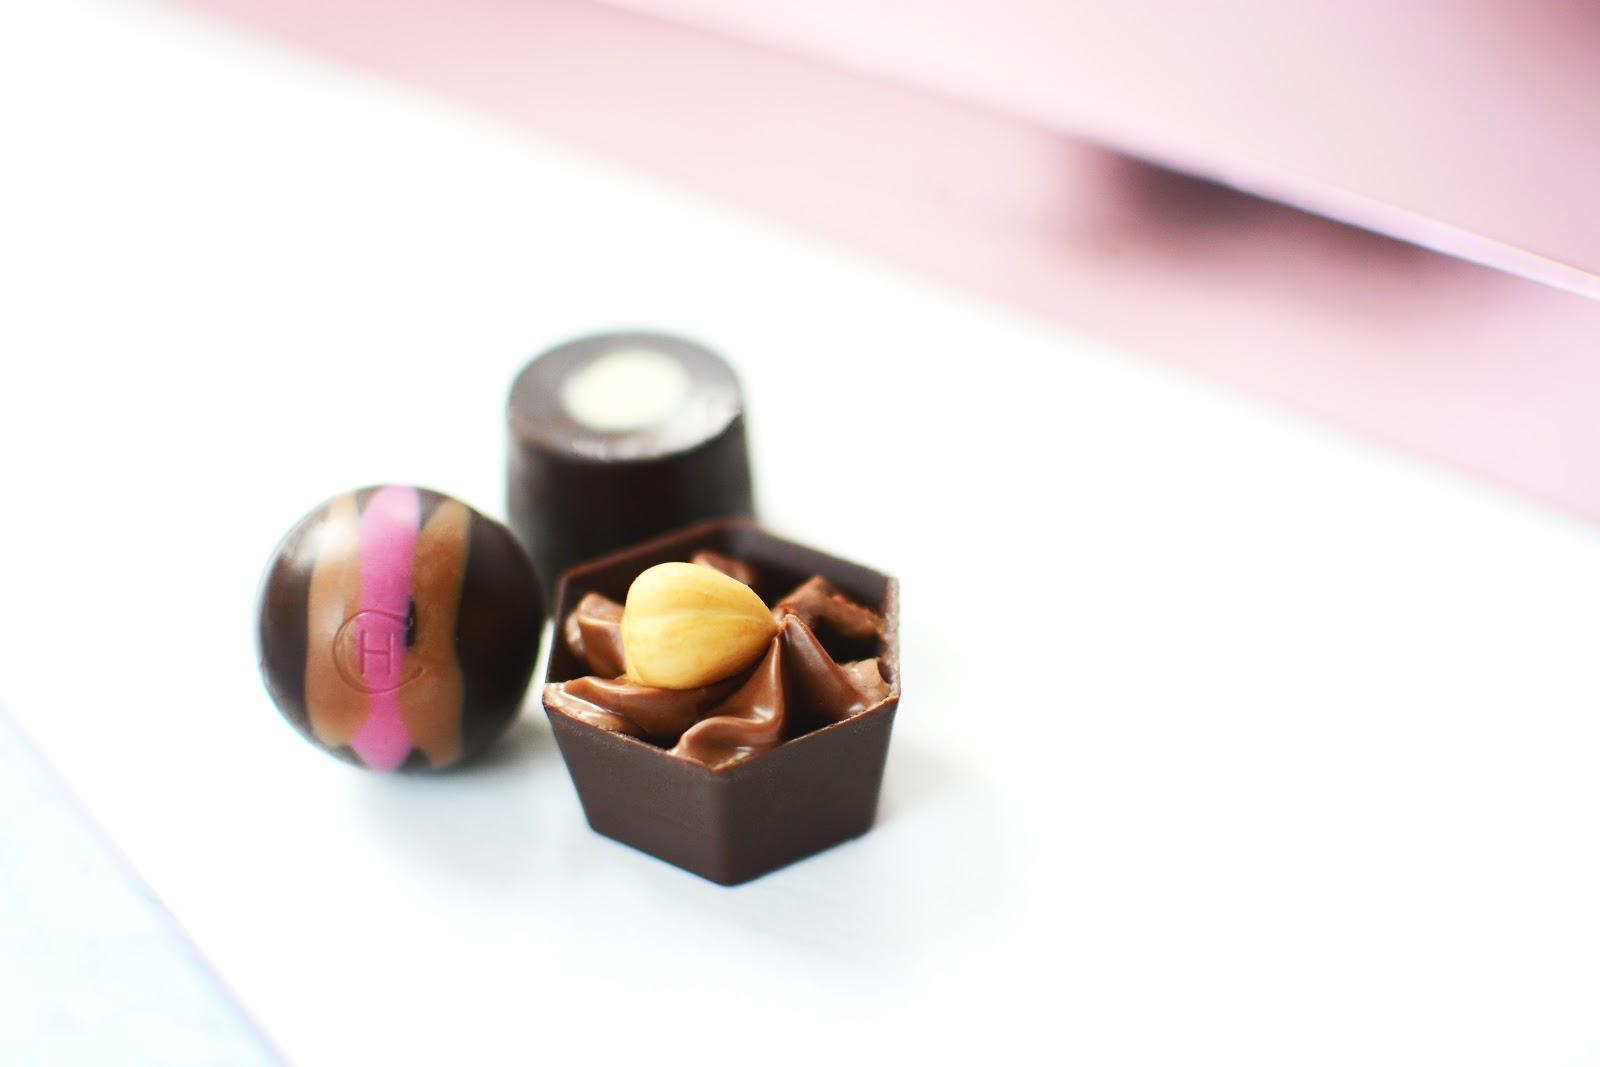 Hotel Chocolat tasting box monthly subscription